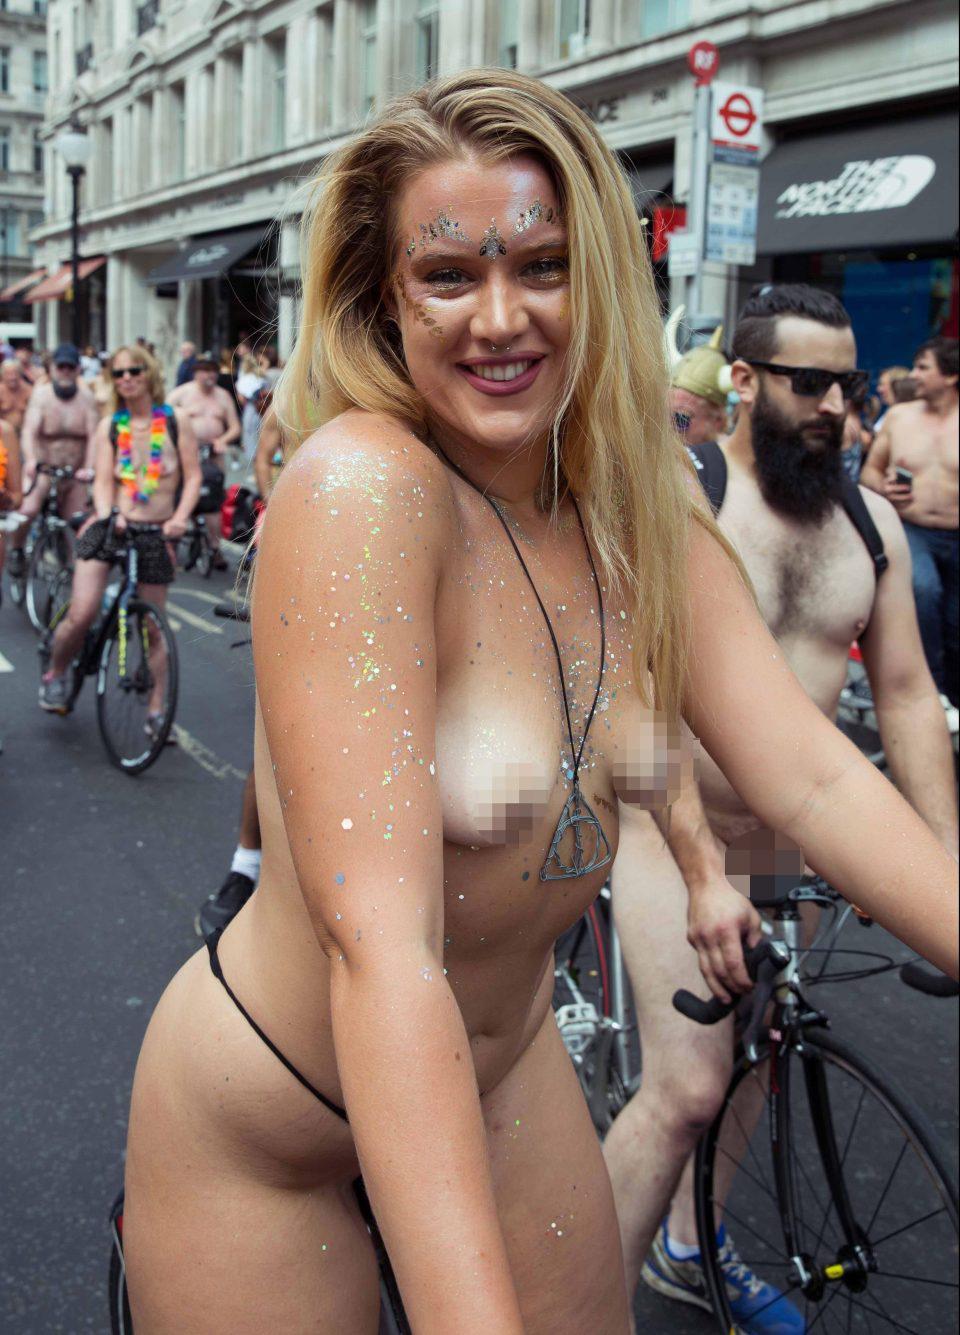 Bike beautiful women ride naked